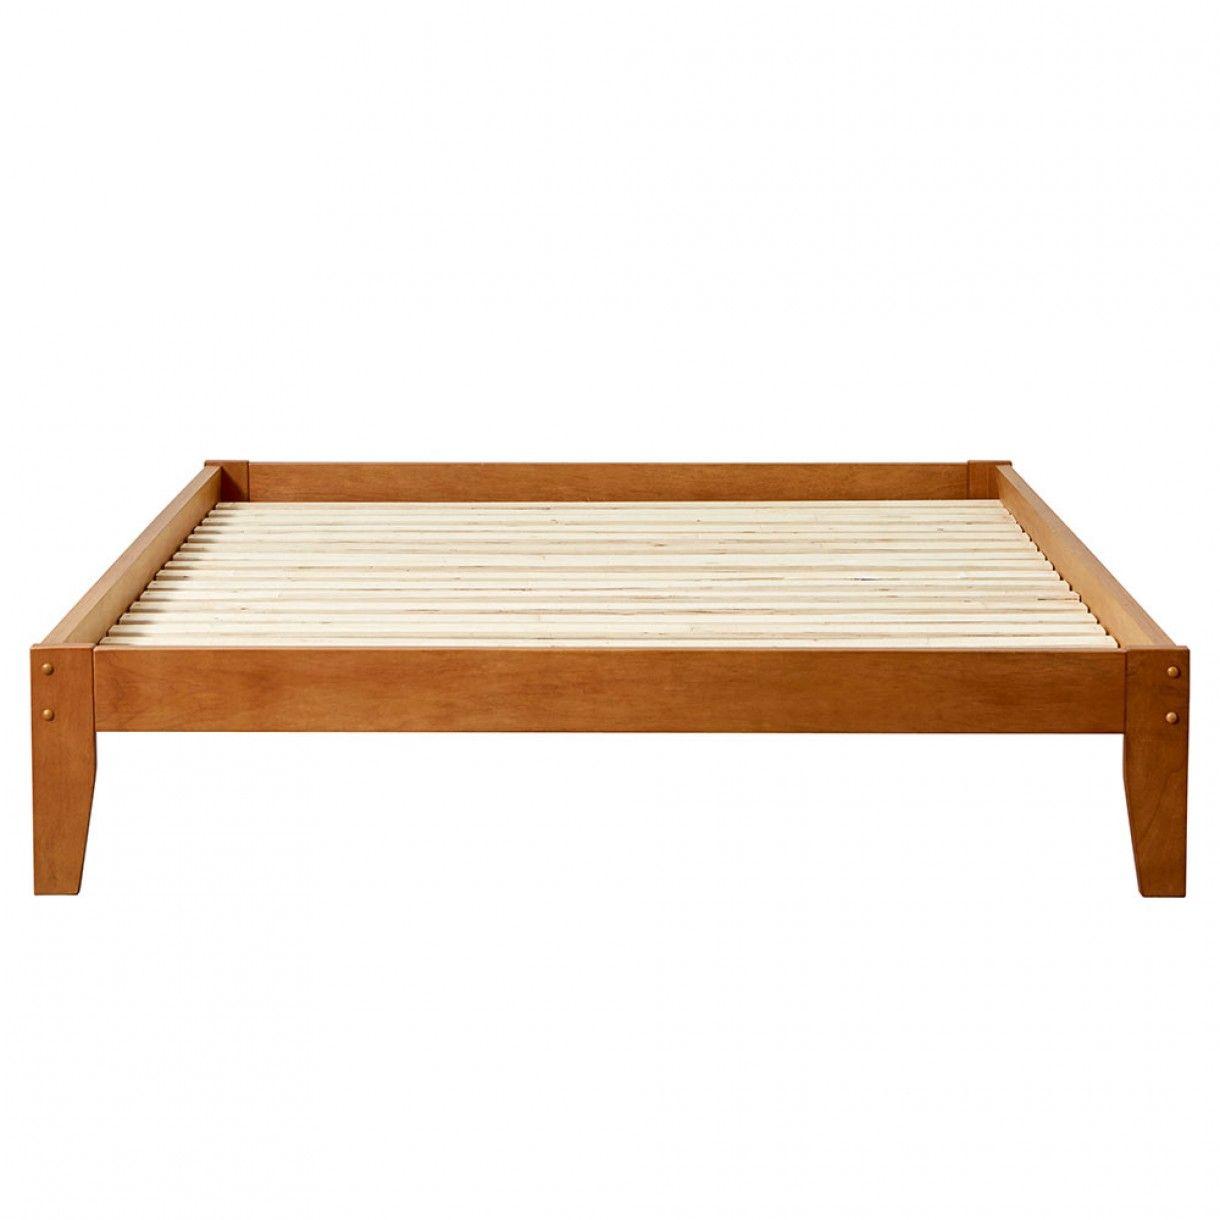 Bed Base King For Mattress 1830 X 2030 Bed Base King Bed Base